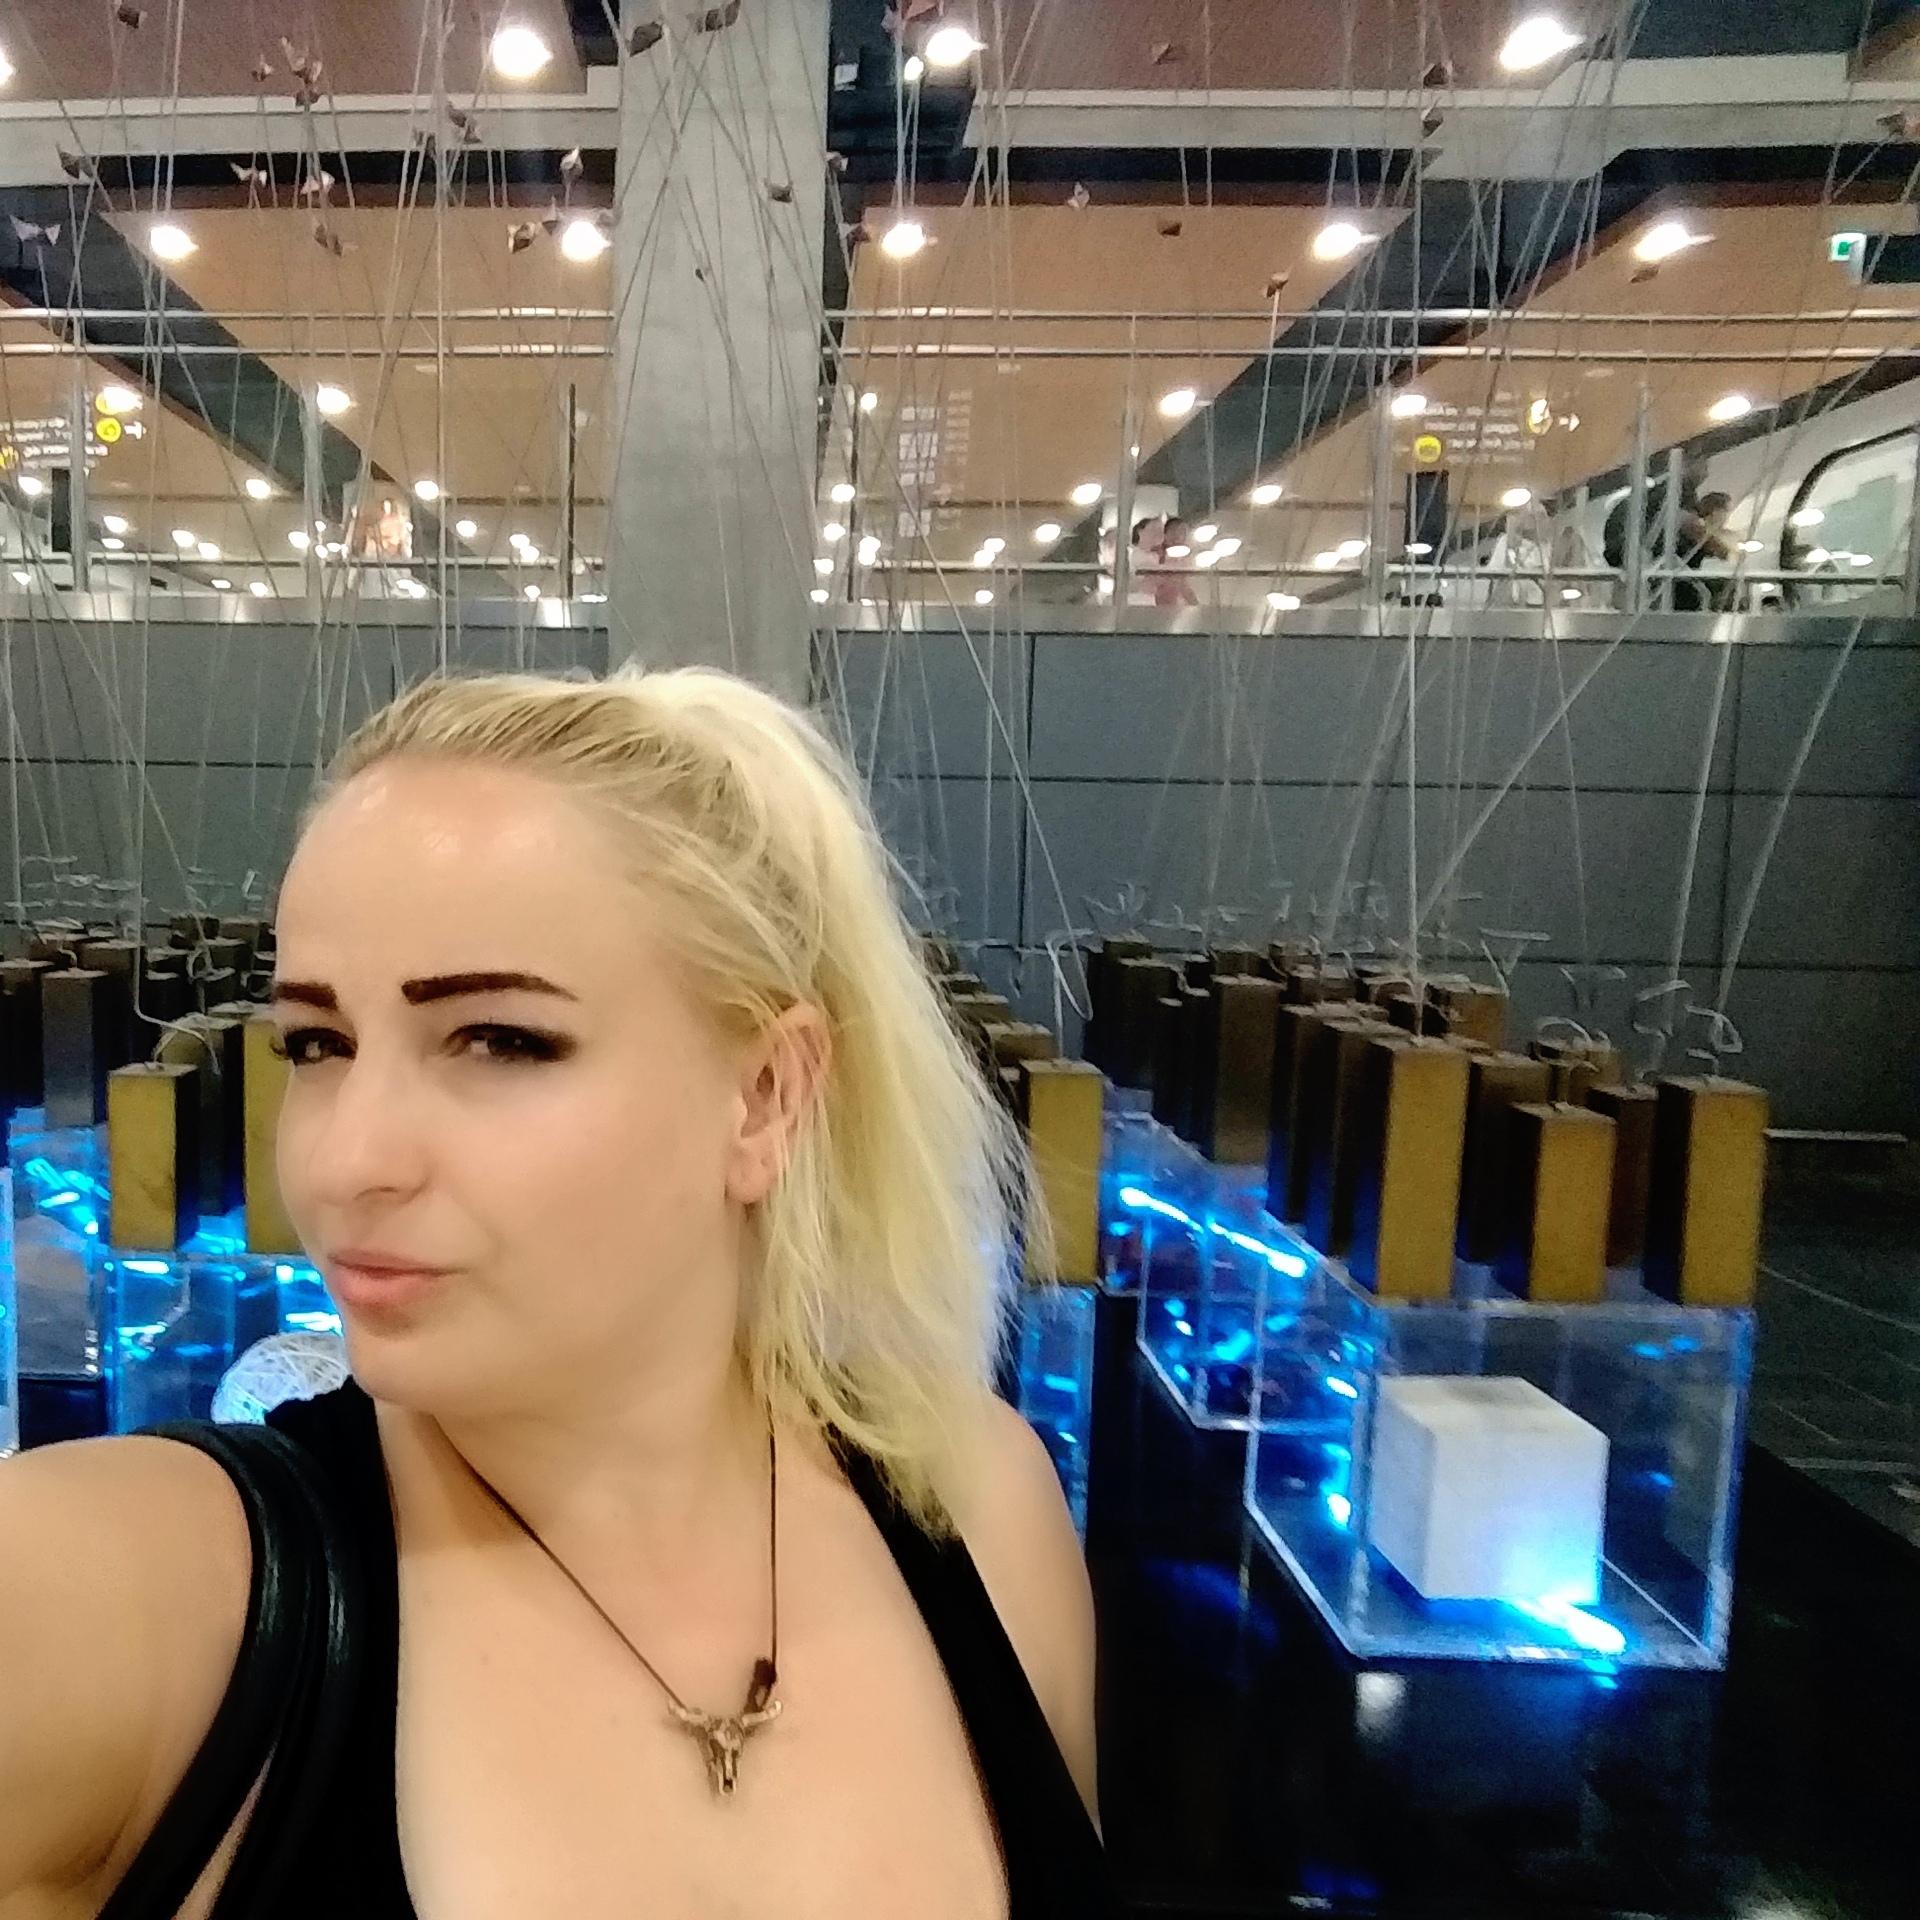 Елена Руденко (Валтея). Кипр. Айия-Напа (фото). L7Z4XpYhZV4